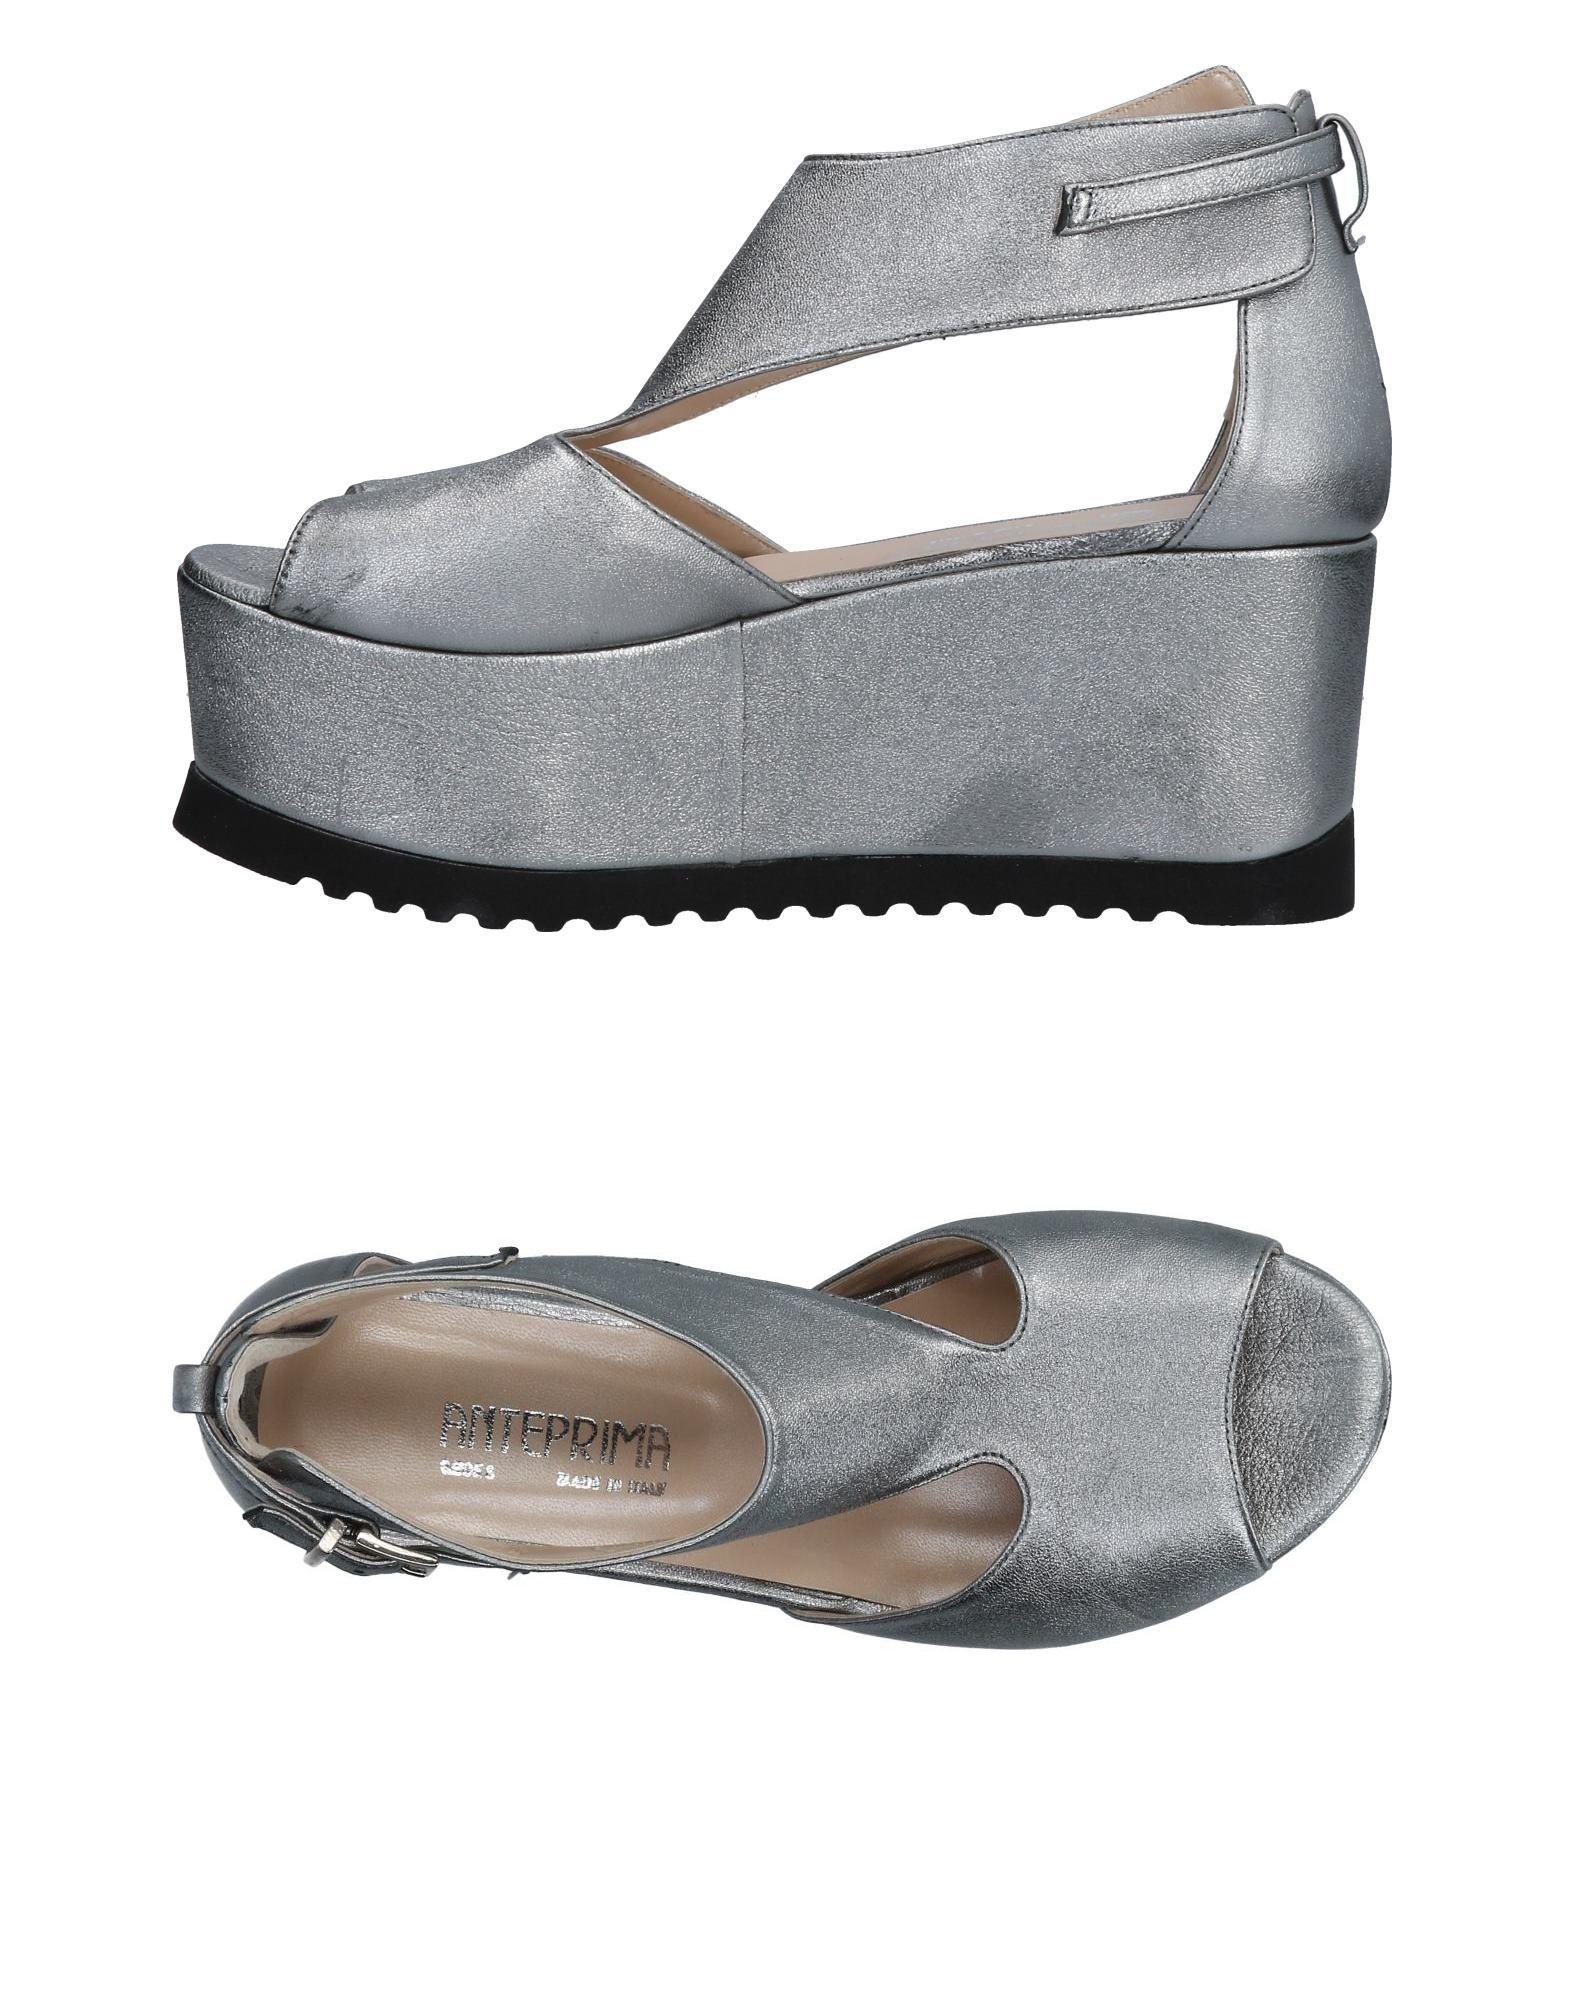 ANTEPRIMA Sandals in Silver